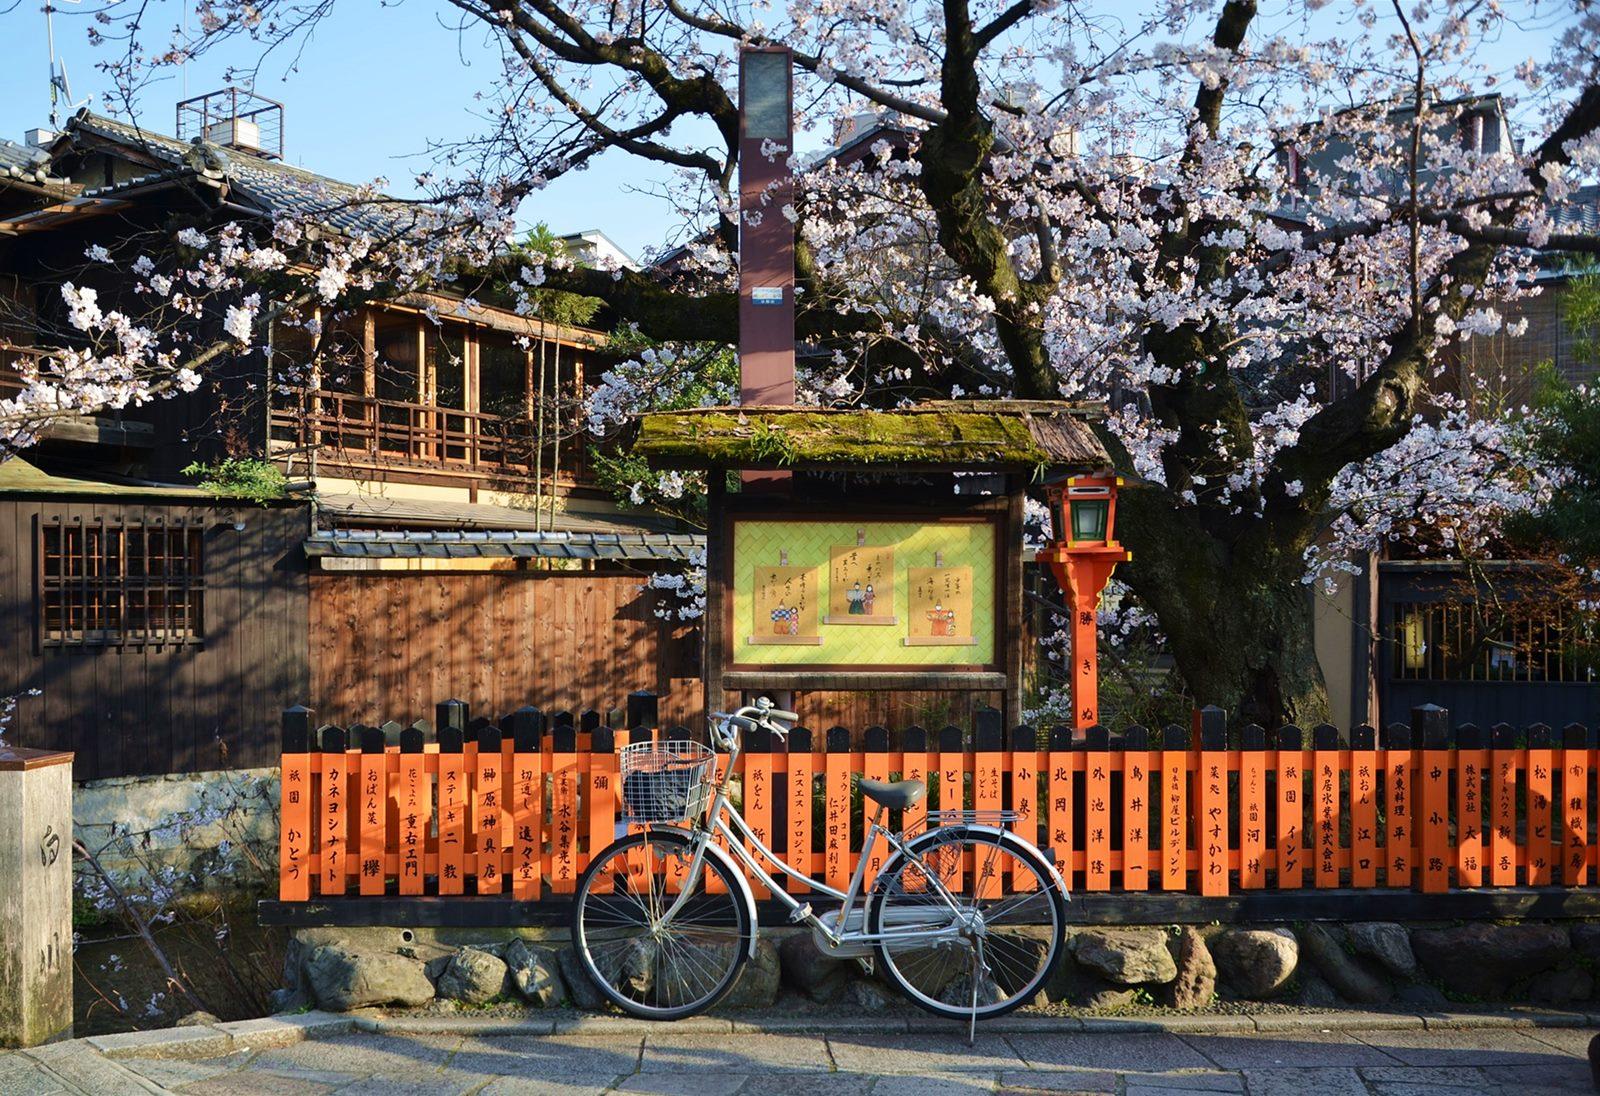 日本-關西-大阪-京都-神戶-奈良-景點-推薦-自由行-旅遊-必玩-必去-必遊-Osaka-Kyoto-Kobe-Nara-Tourist-Attraction-Travel-Japan